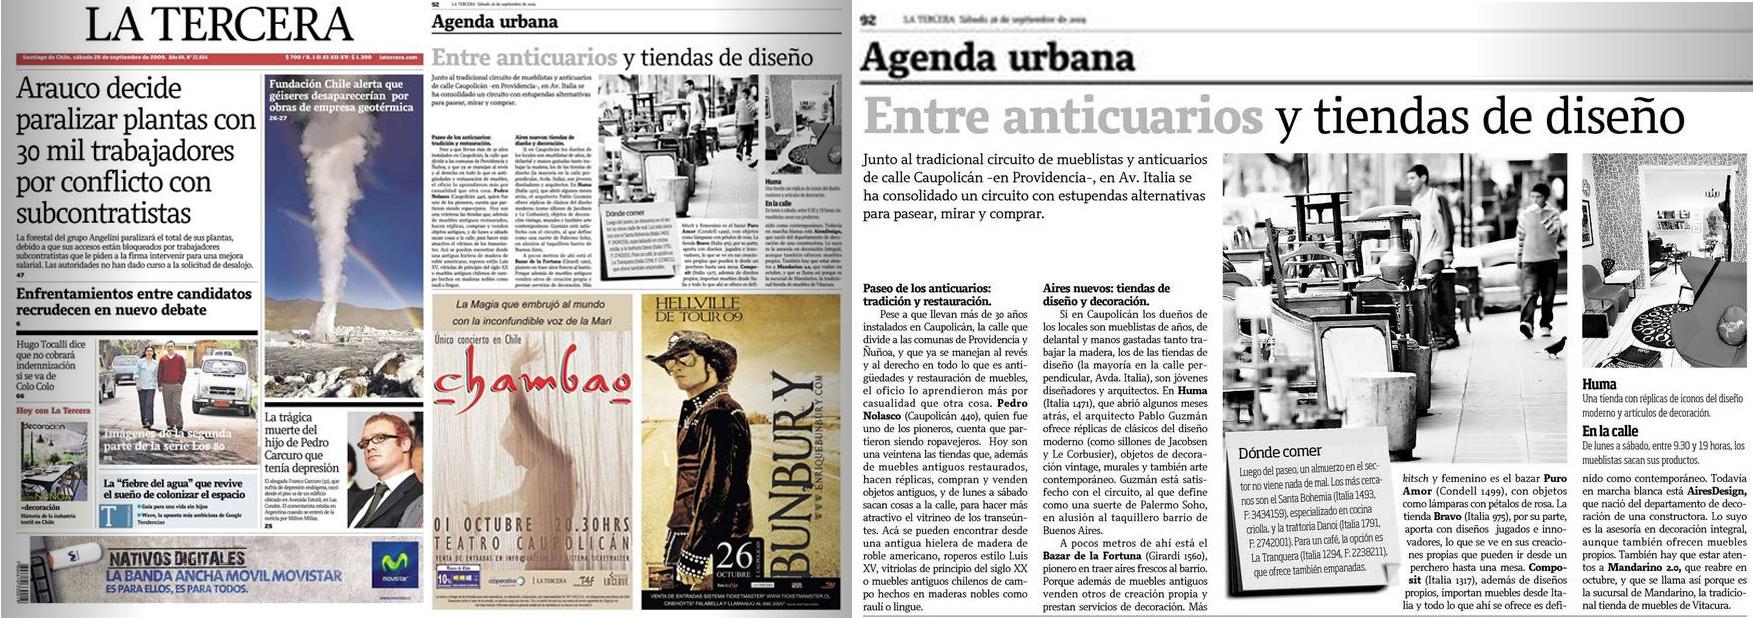 Diario la tercera 26 sept 2009 agenda urbana.jpg